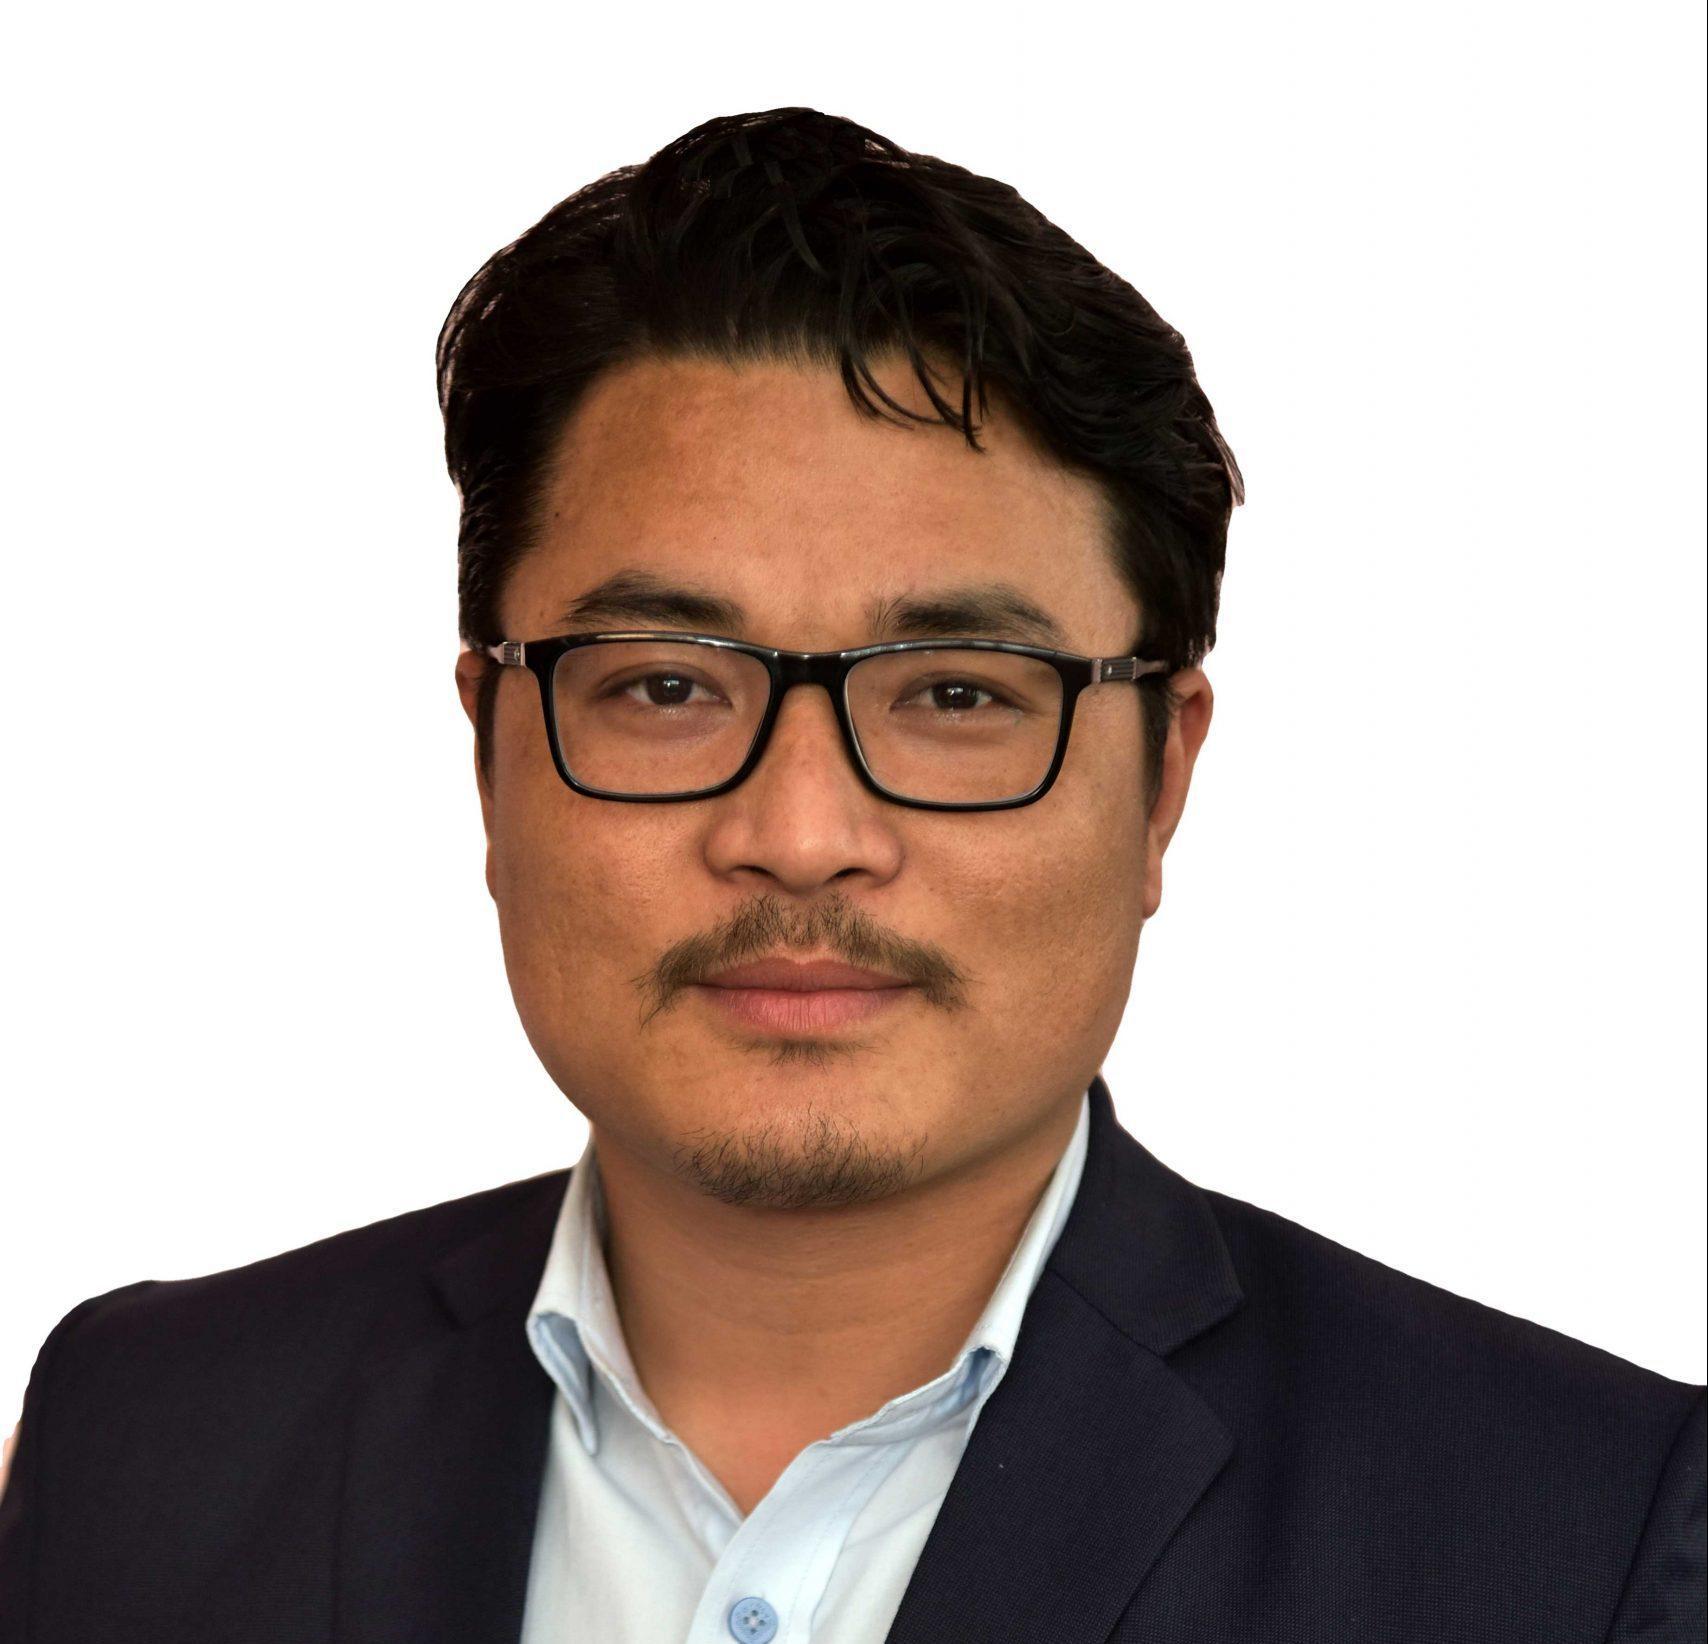 Kabiraj-Rajalim-Rai-manager-content-writer